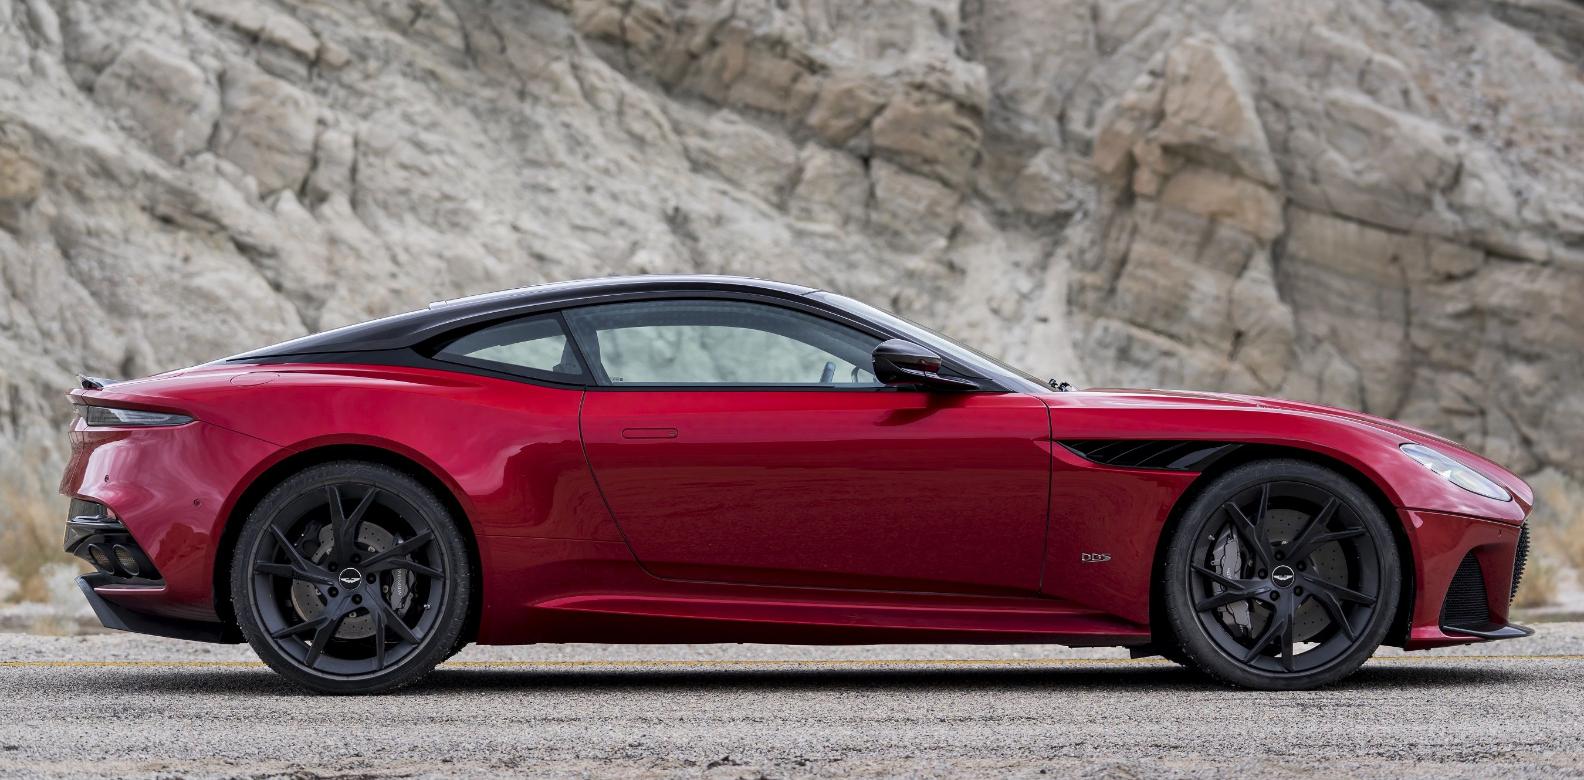 The Aston Martin DBS Superleggera Launches In Hong Kong Hong Kong - Aston martin dbs